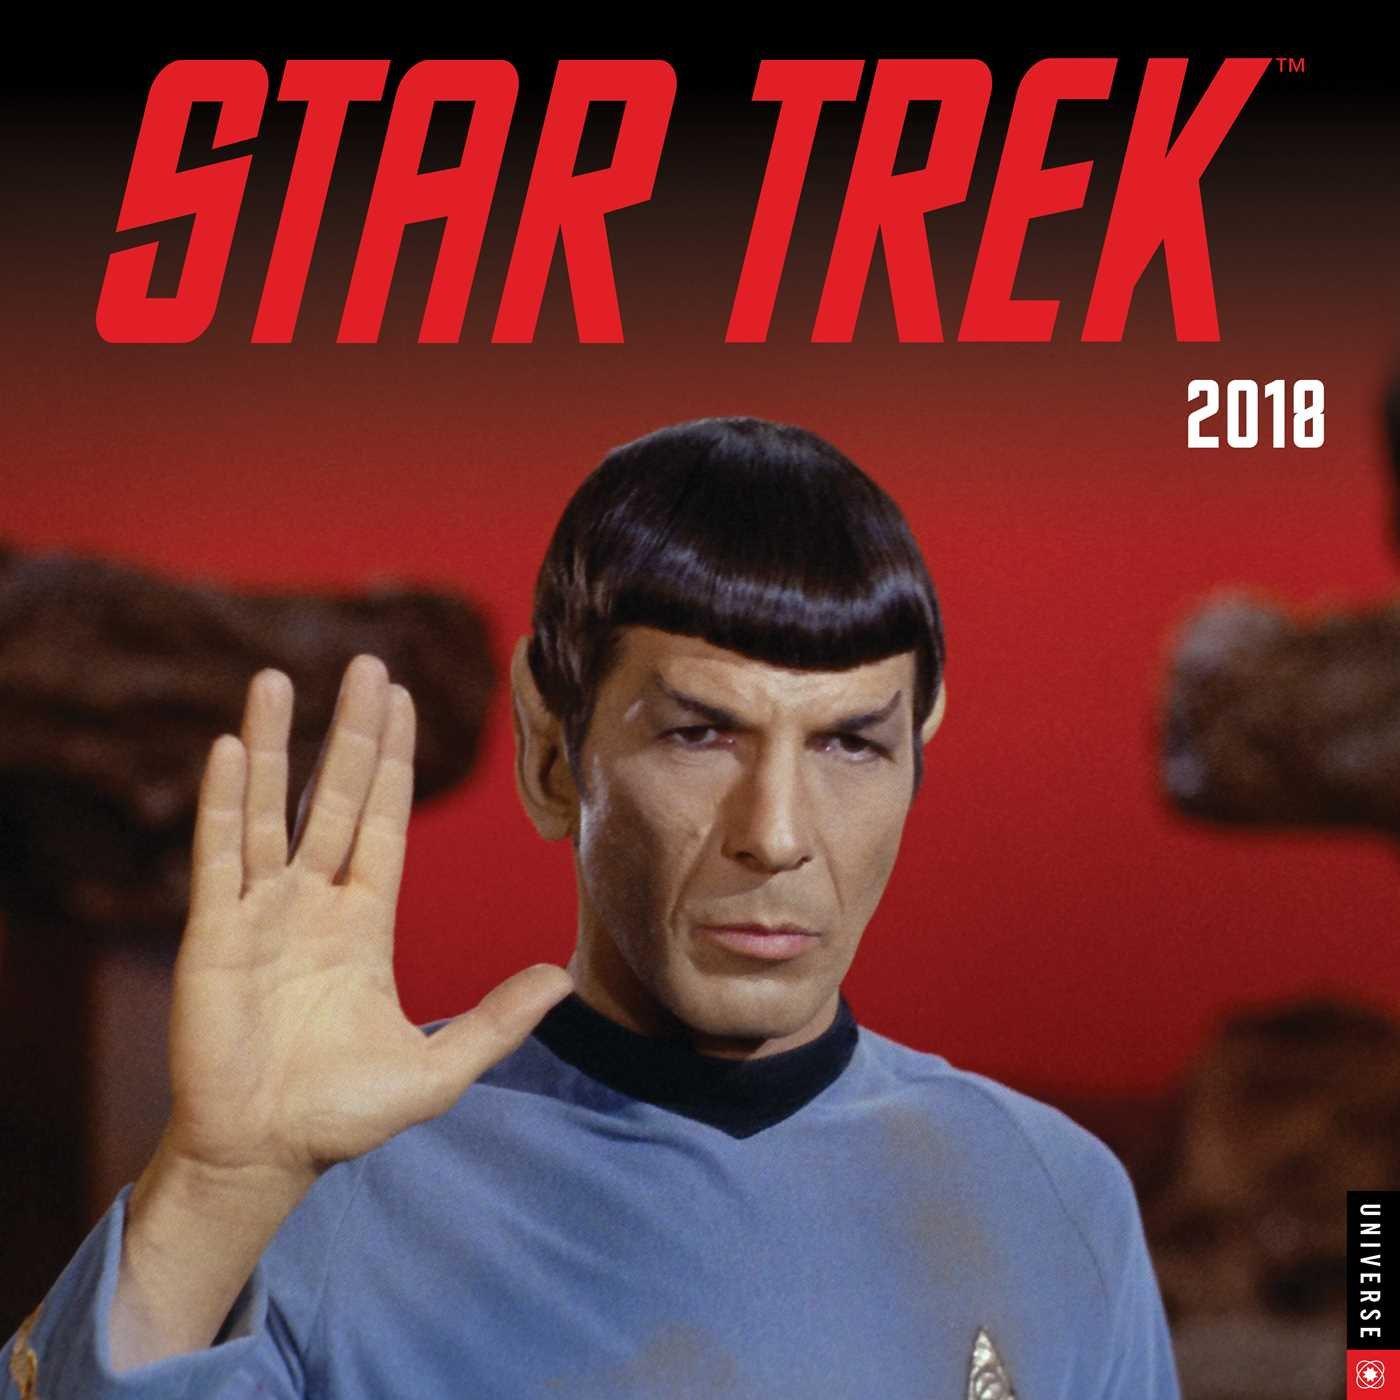 Star Trek 2018 Wall Calendar: The Original Series by Universe Publishing